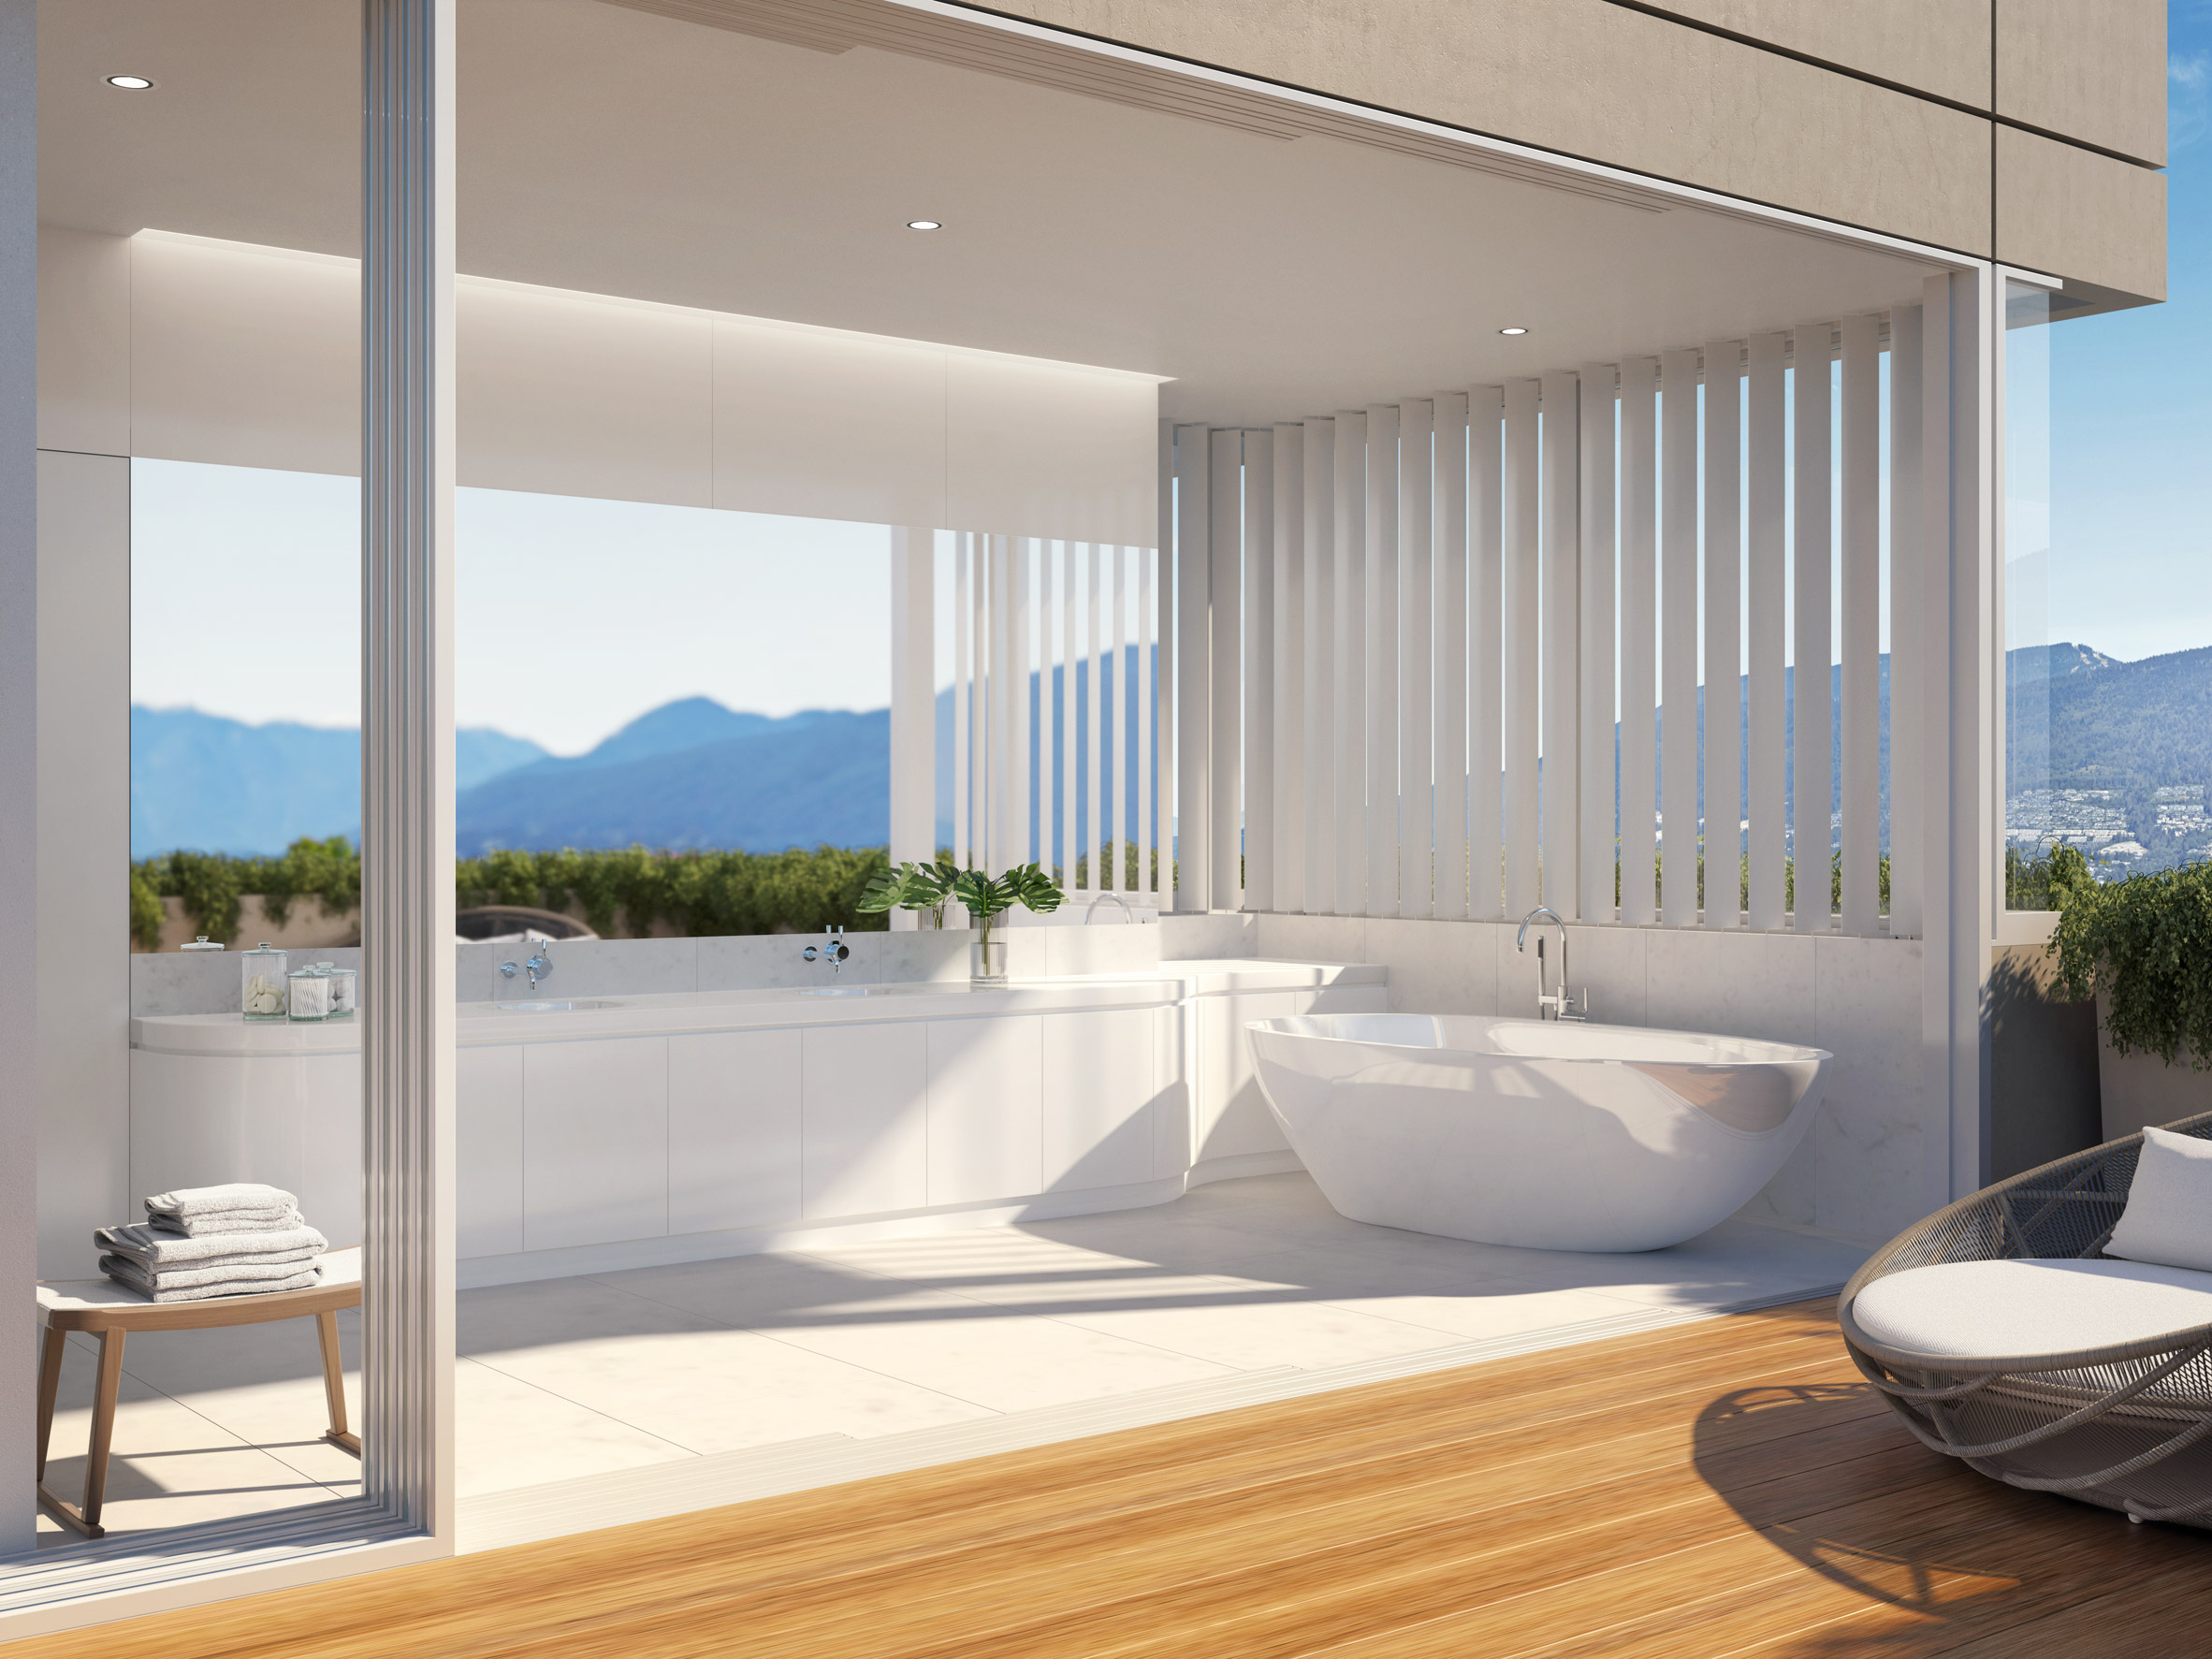 Terrace House by Shigeru Ban